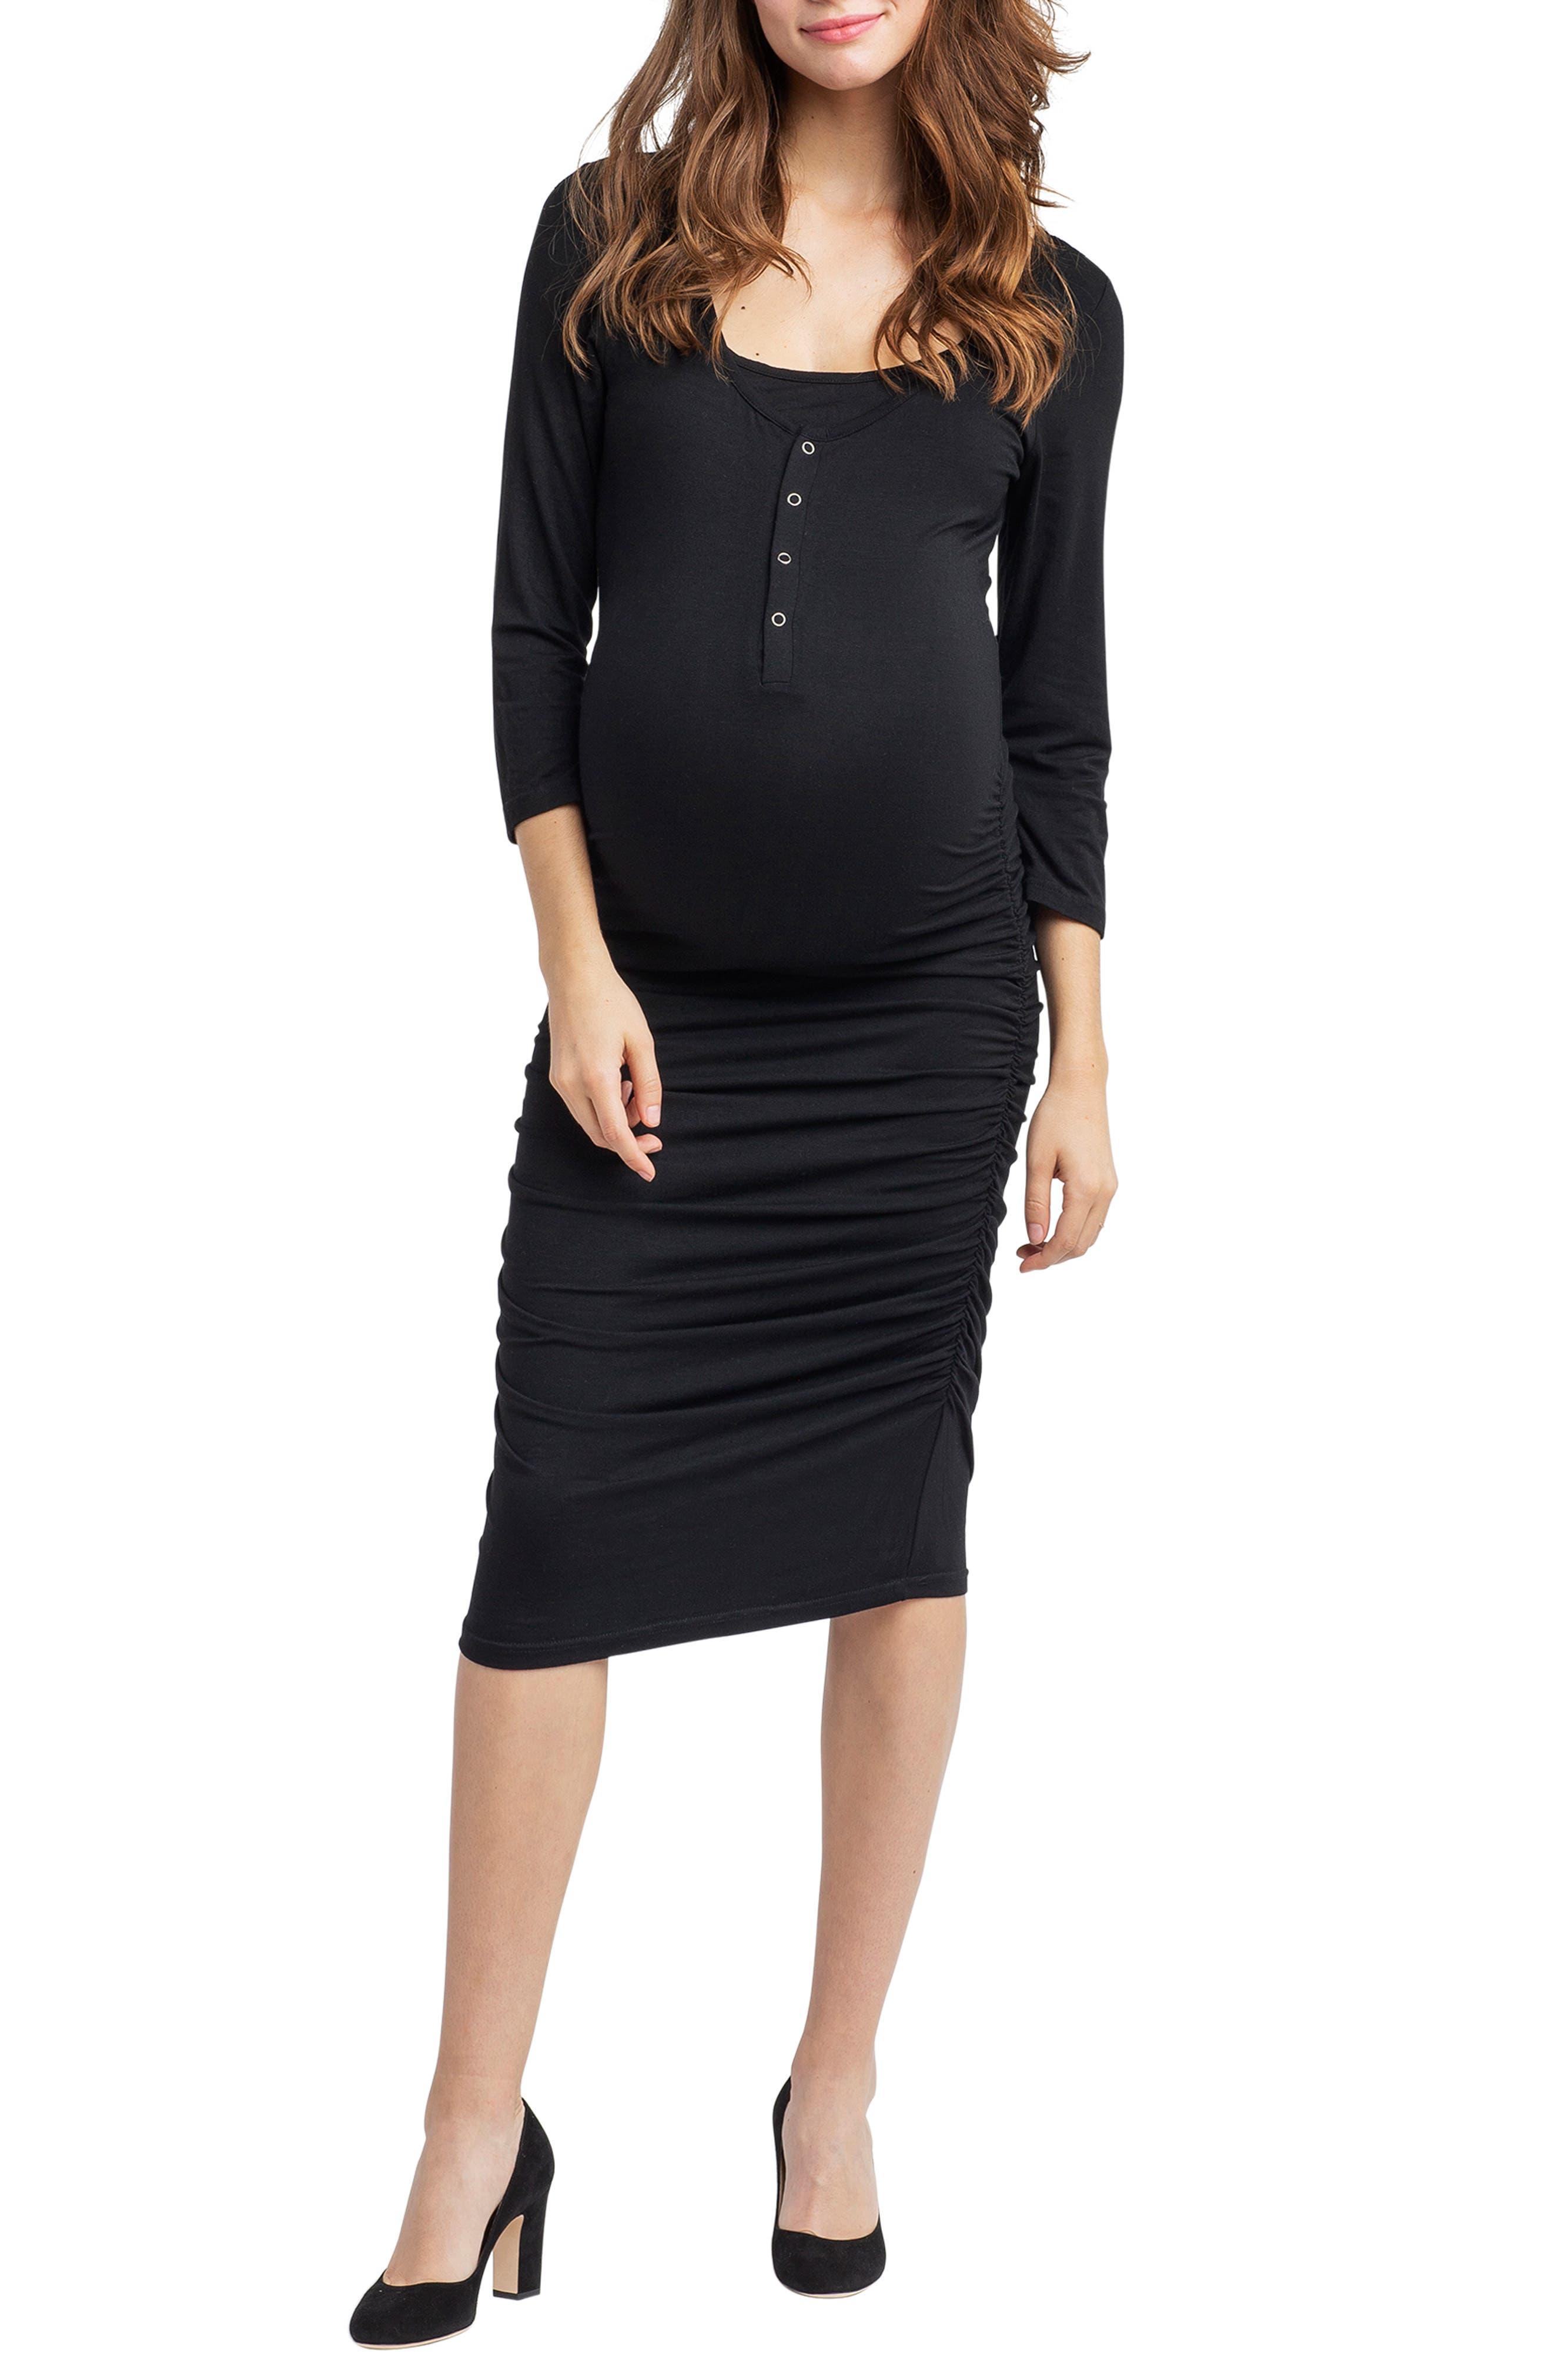 Nom Henley Maternity Dress,                             Main thumbnail 1, color,                             BLACK